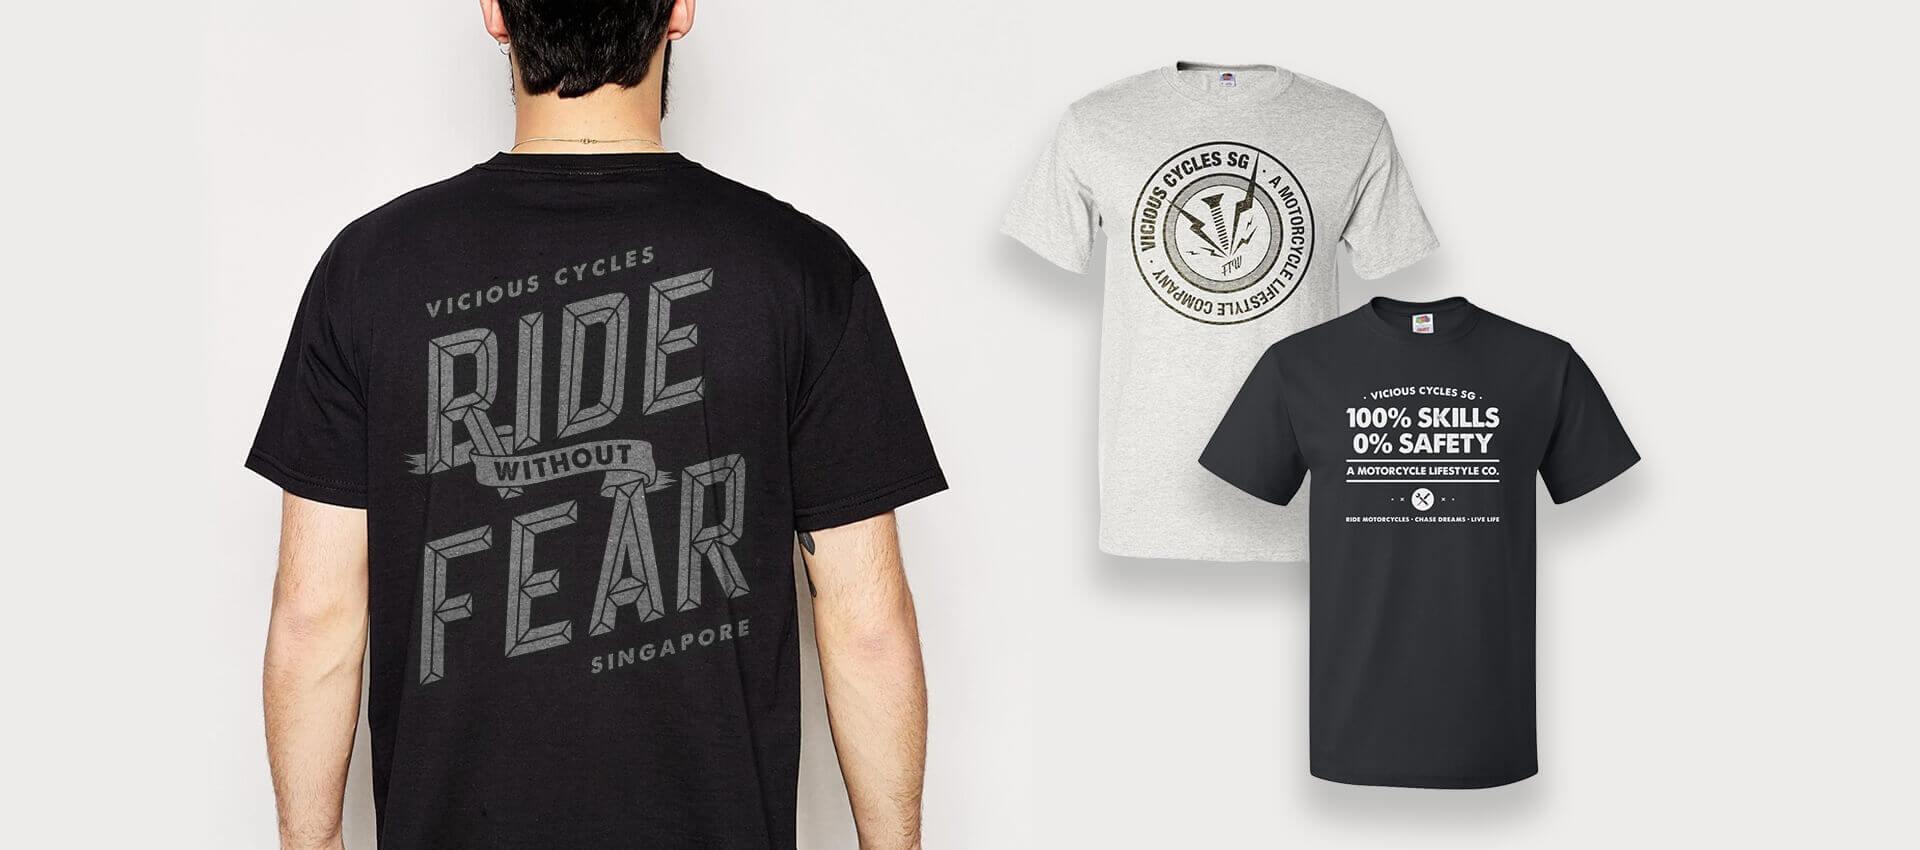 Brand merchandising and merchandise design